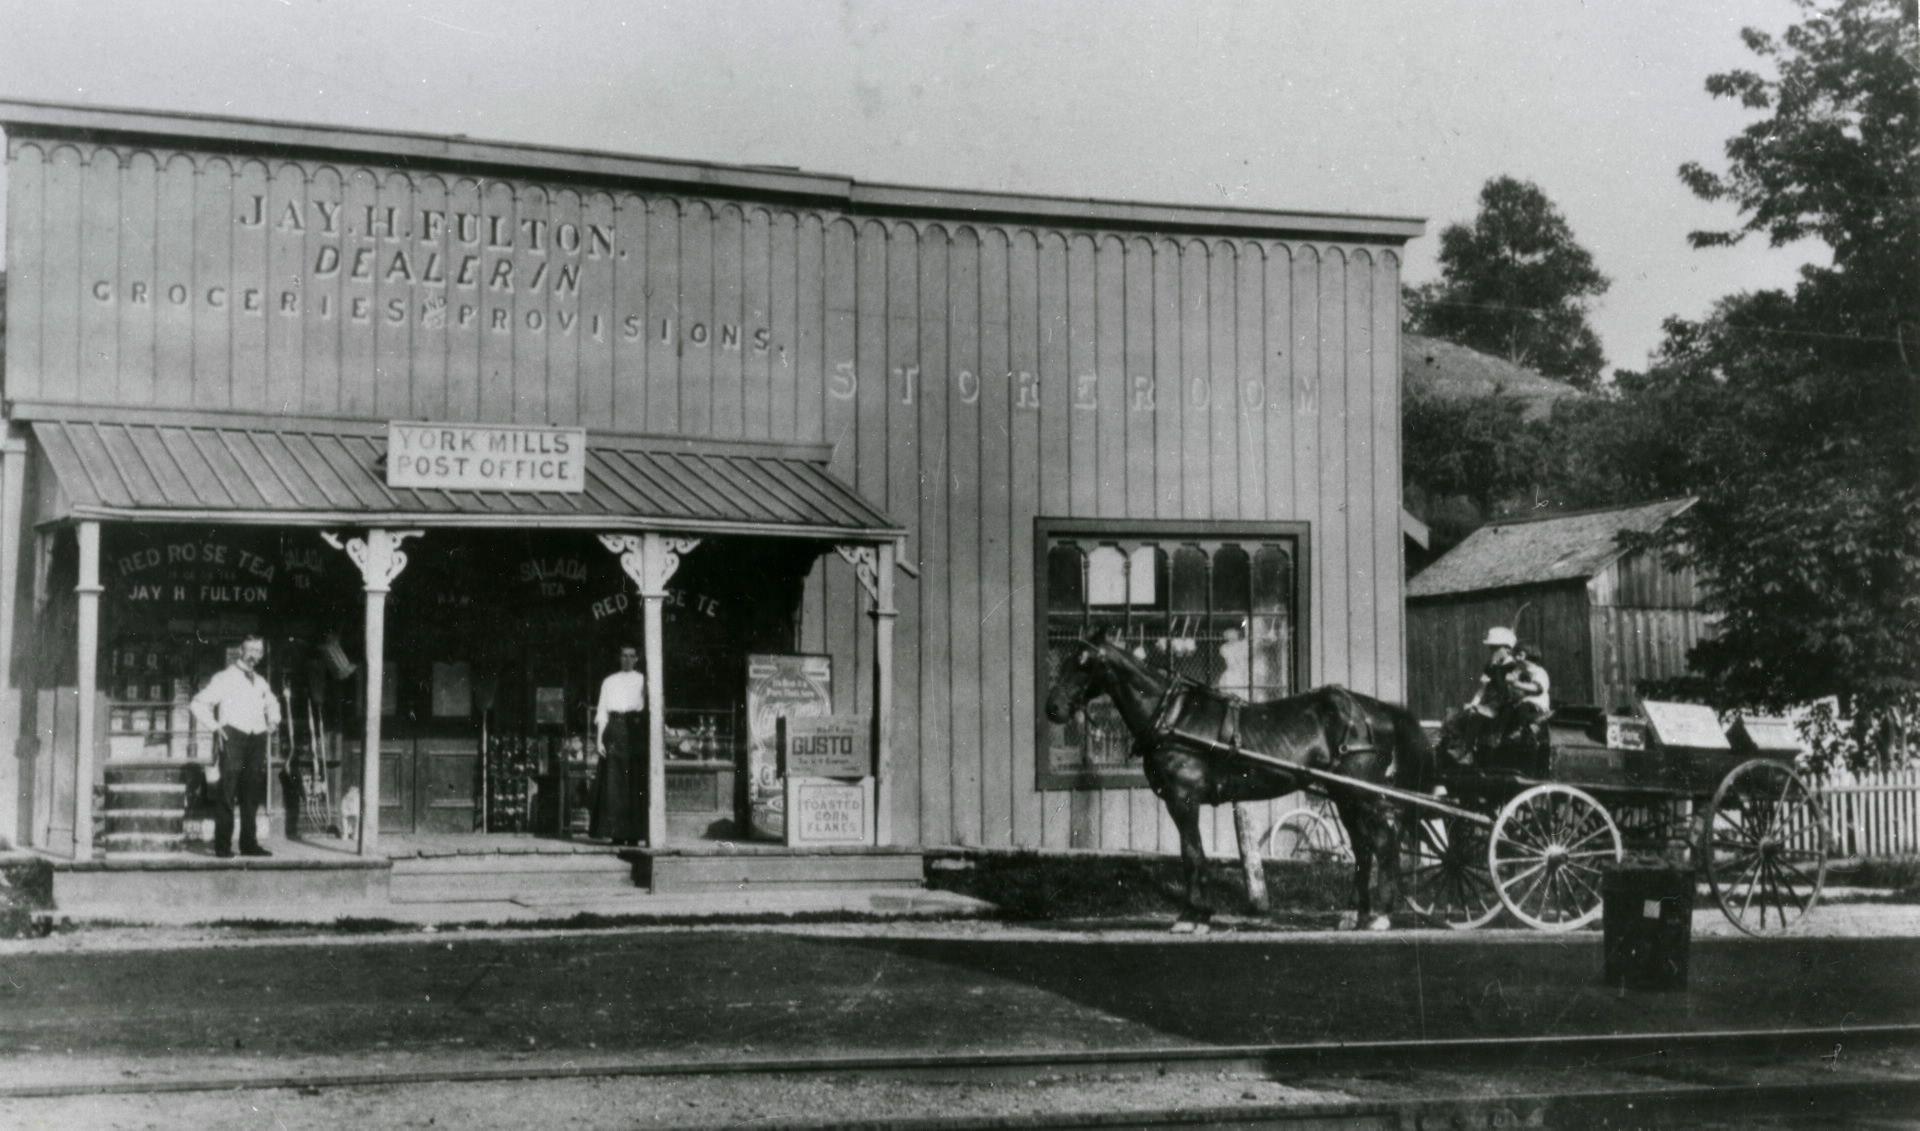 fulton u0026 39 s store and york mills post office  e  side yonge